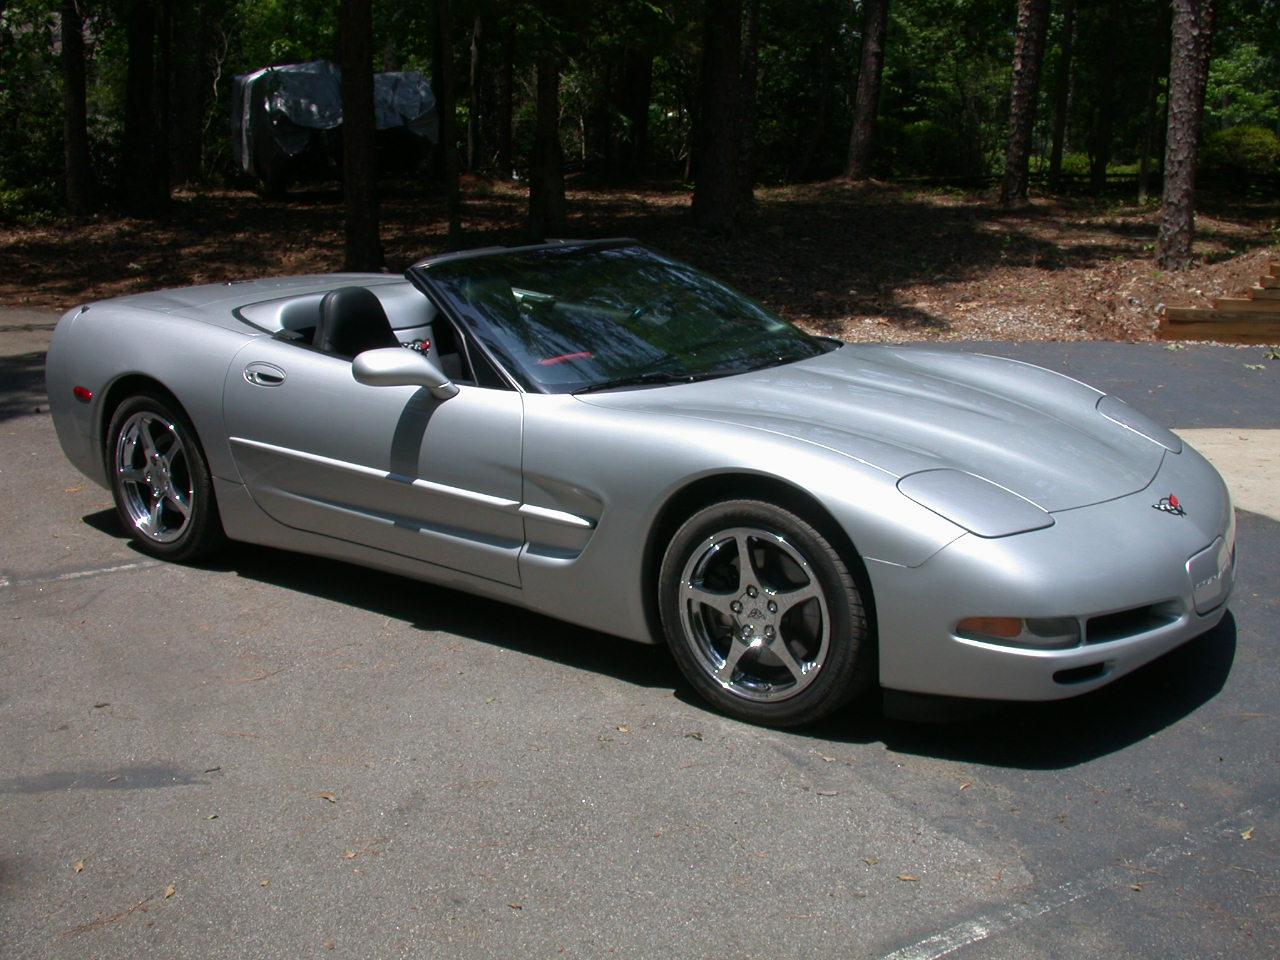 for sale by slim 1999 chevrolet corvette convertible. Black Bedroom Furniture Sets. Home Design Ideas